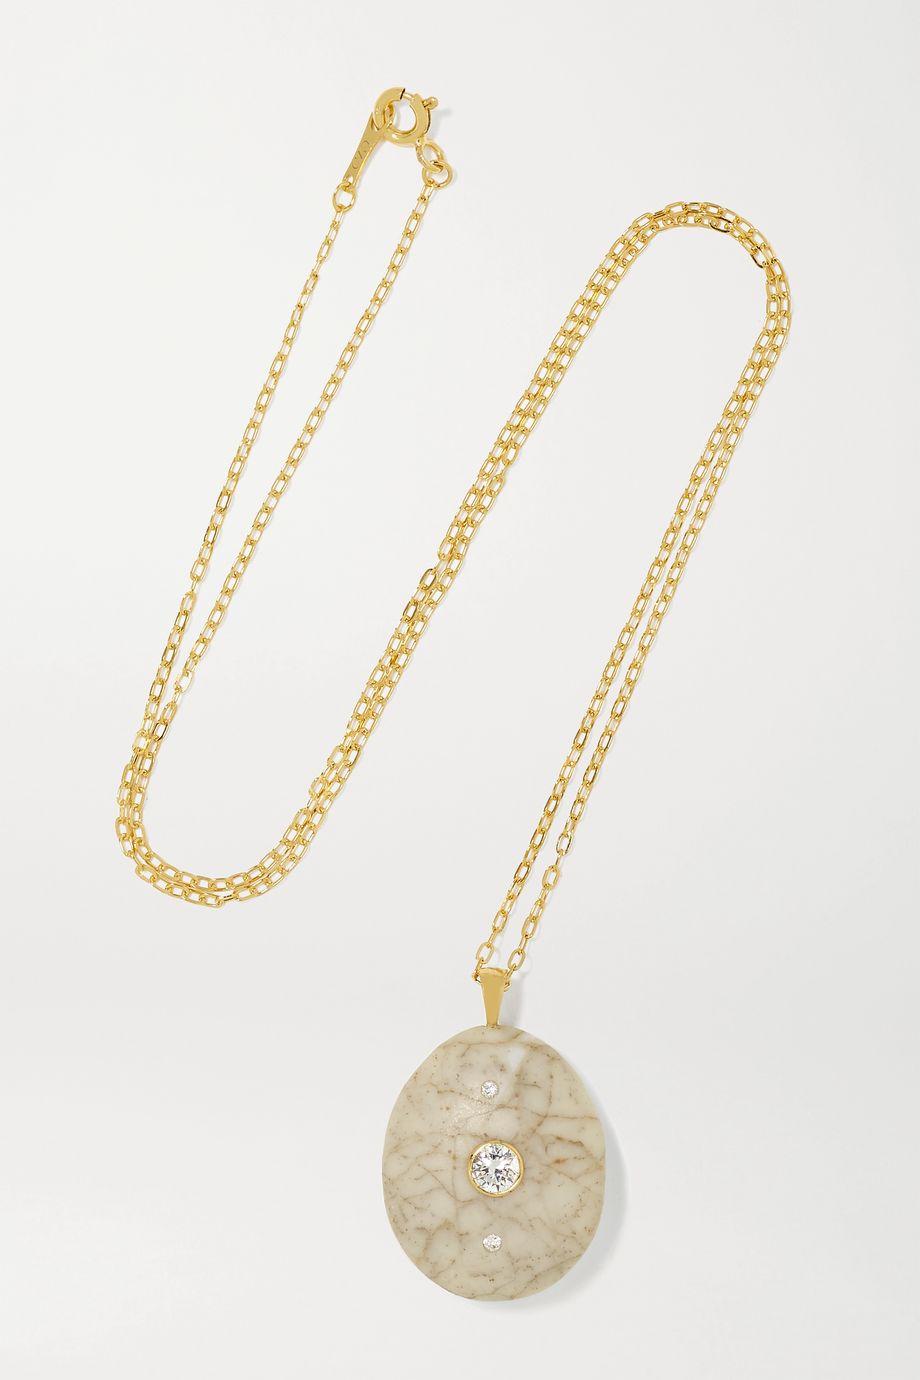 CVC Stones Network 18-karat gold, stone and diamond necklace